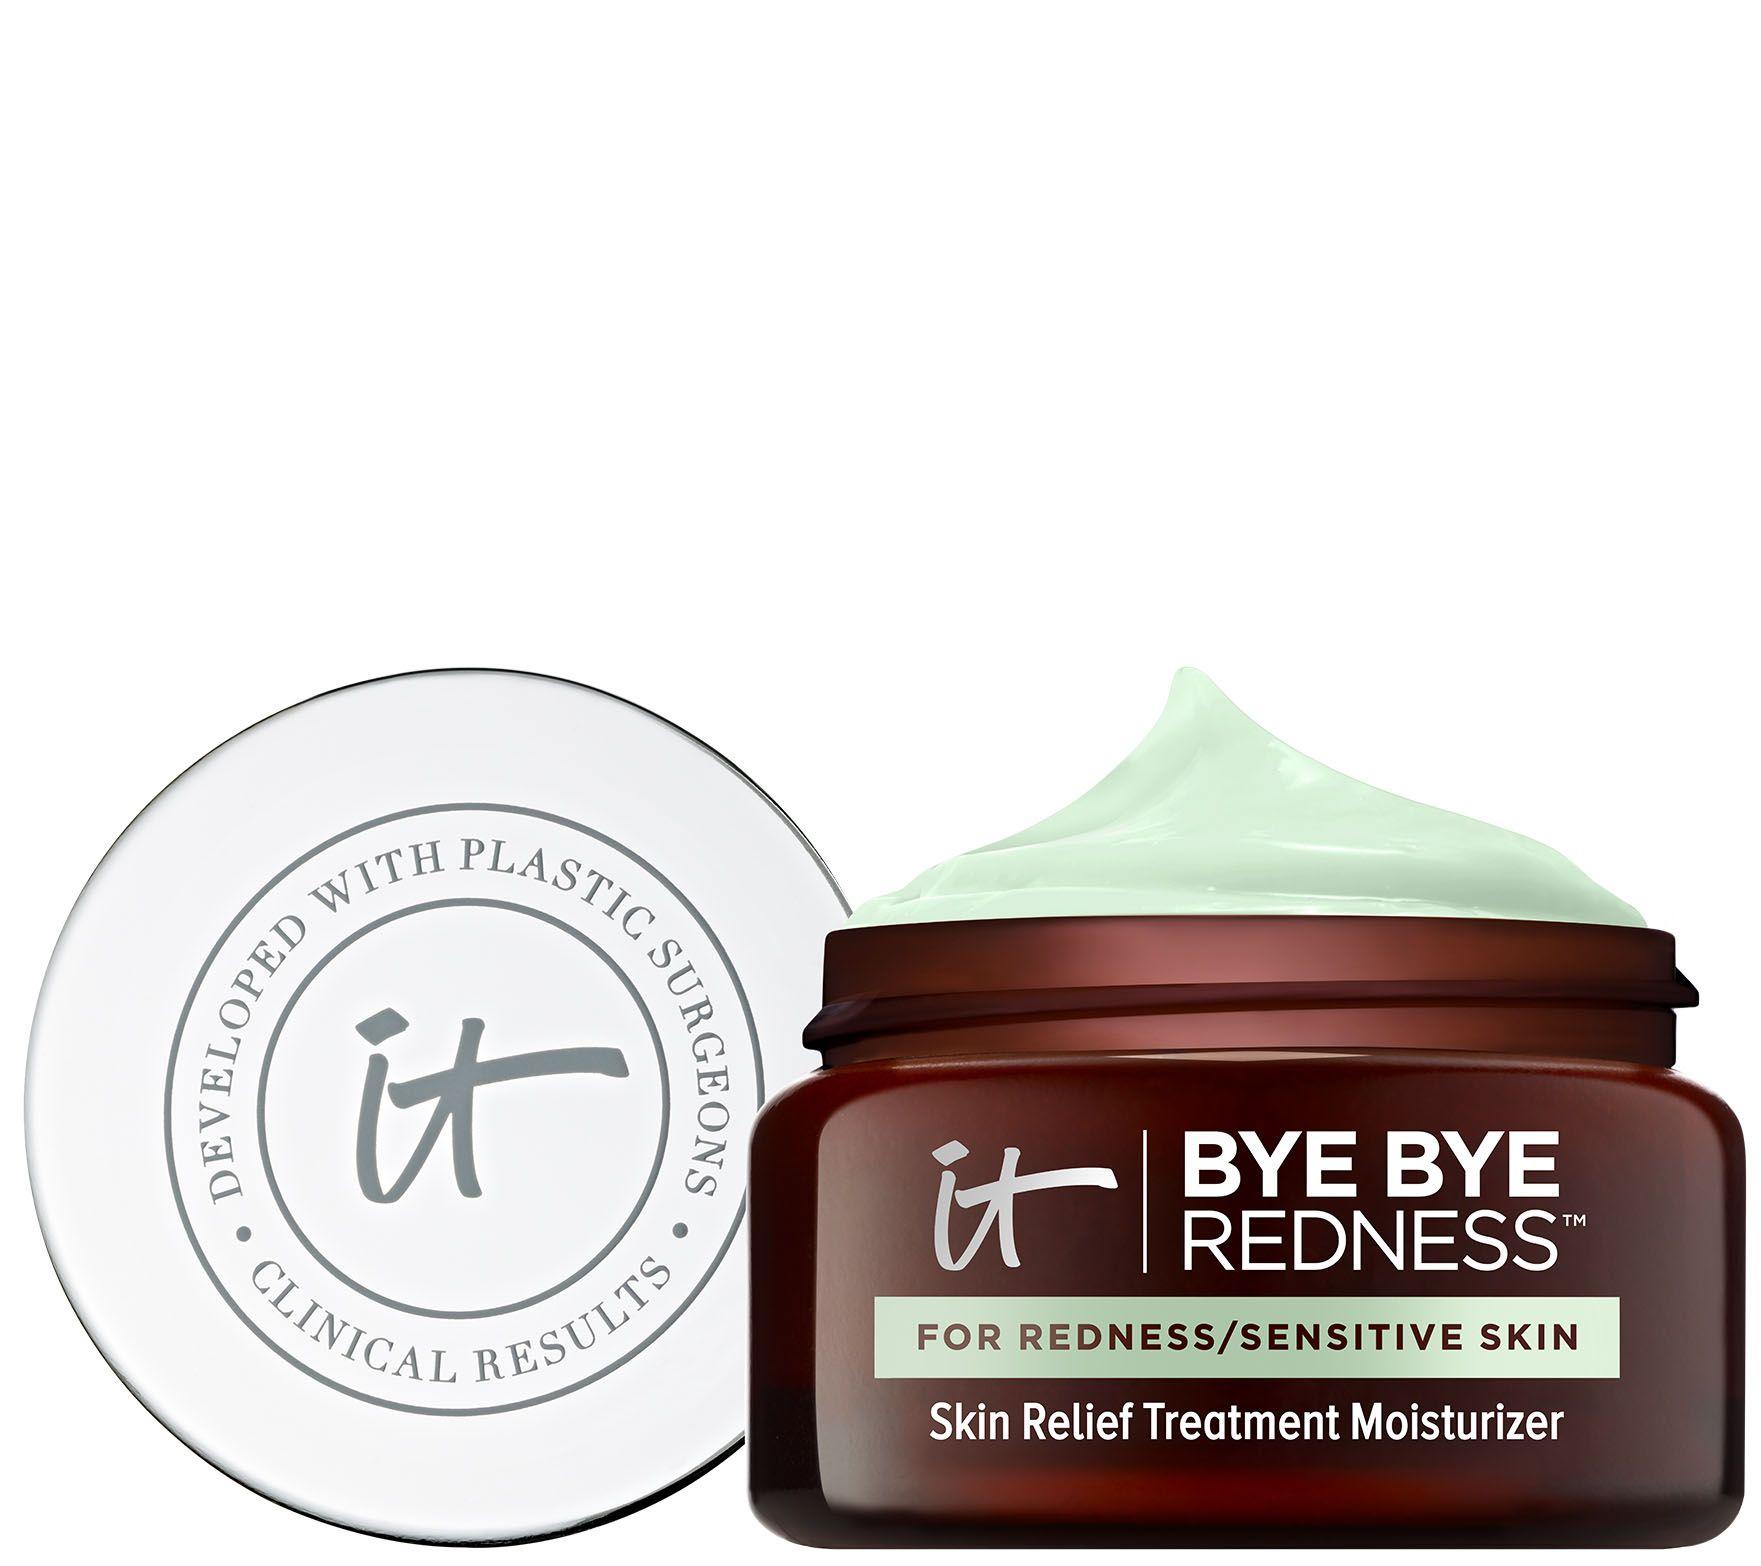 Bye Bye Eczema: The Ultimate Skin Relief Guide